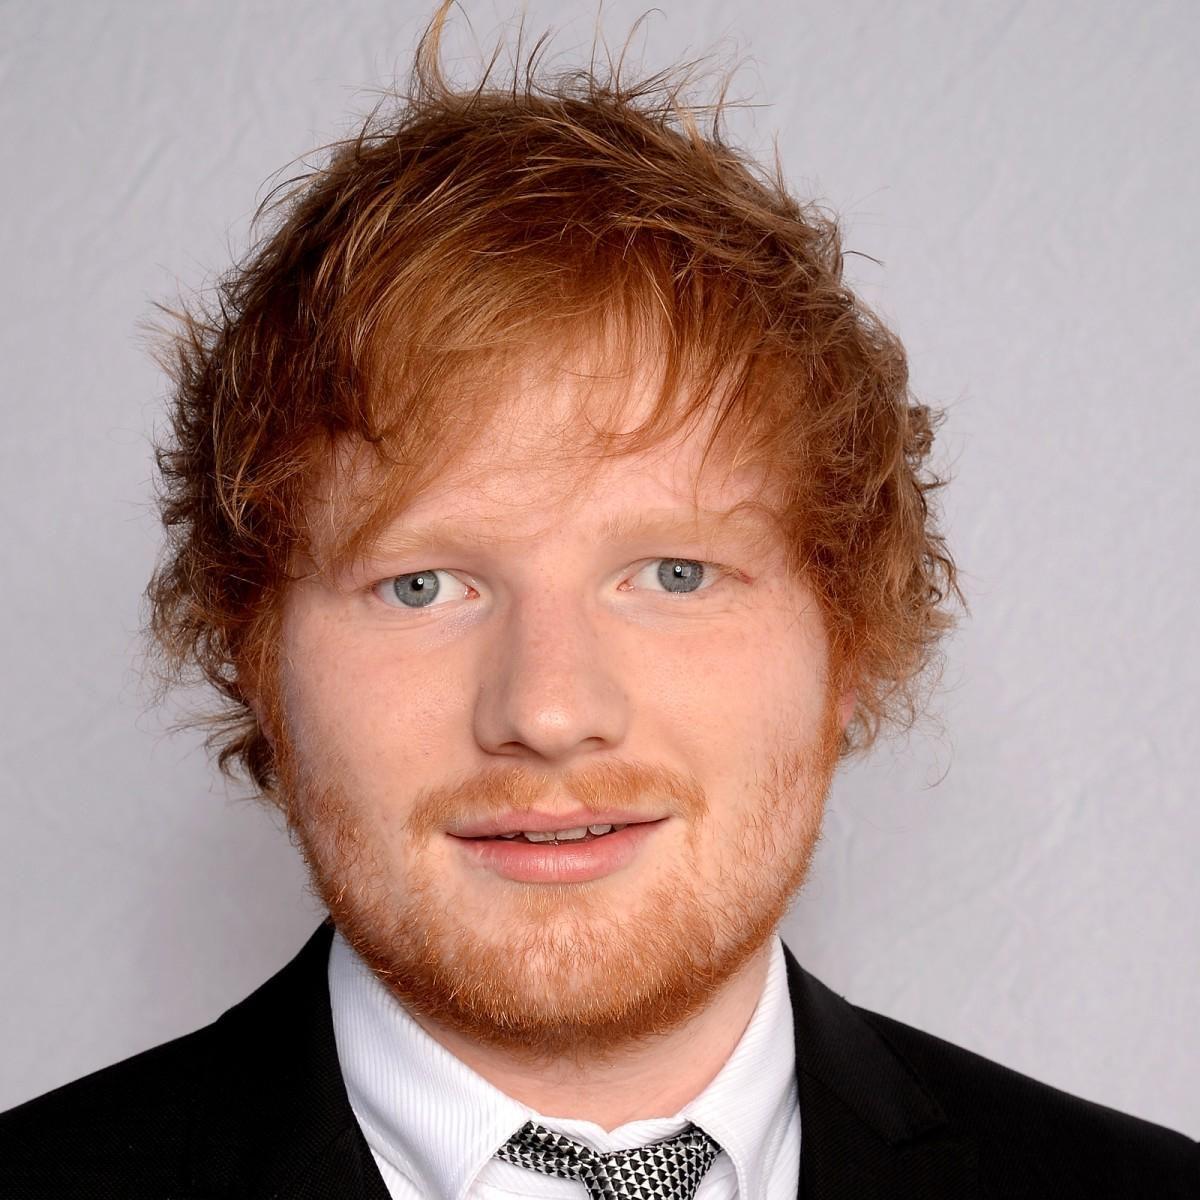 Photograph Ed Sheeran Letras Mus Br